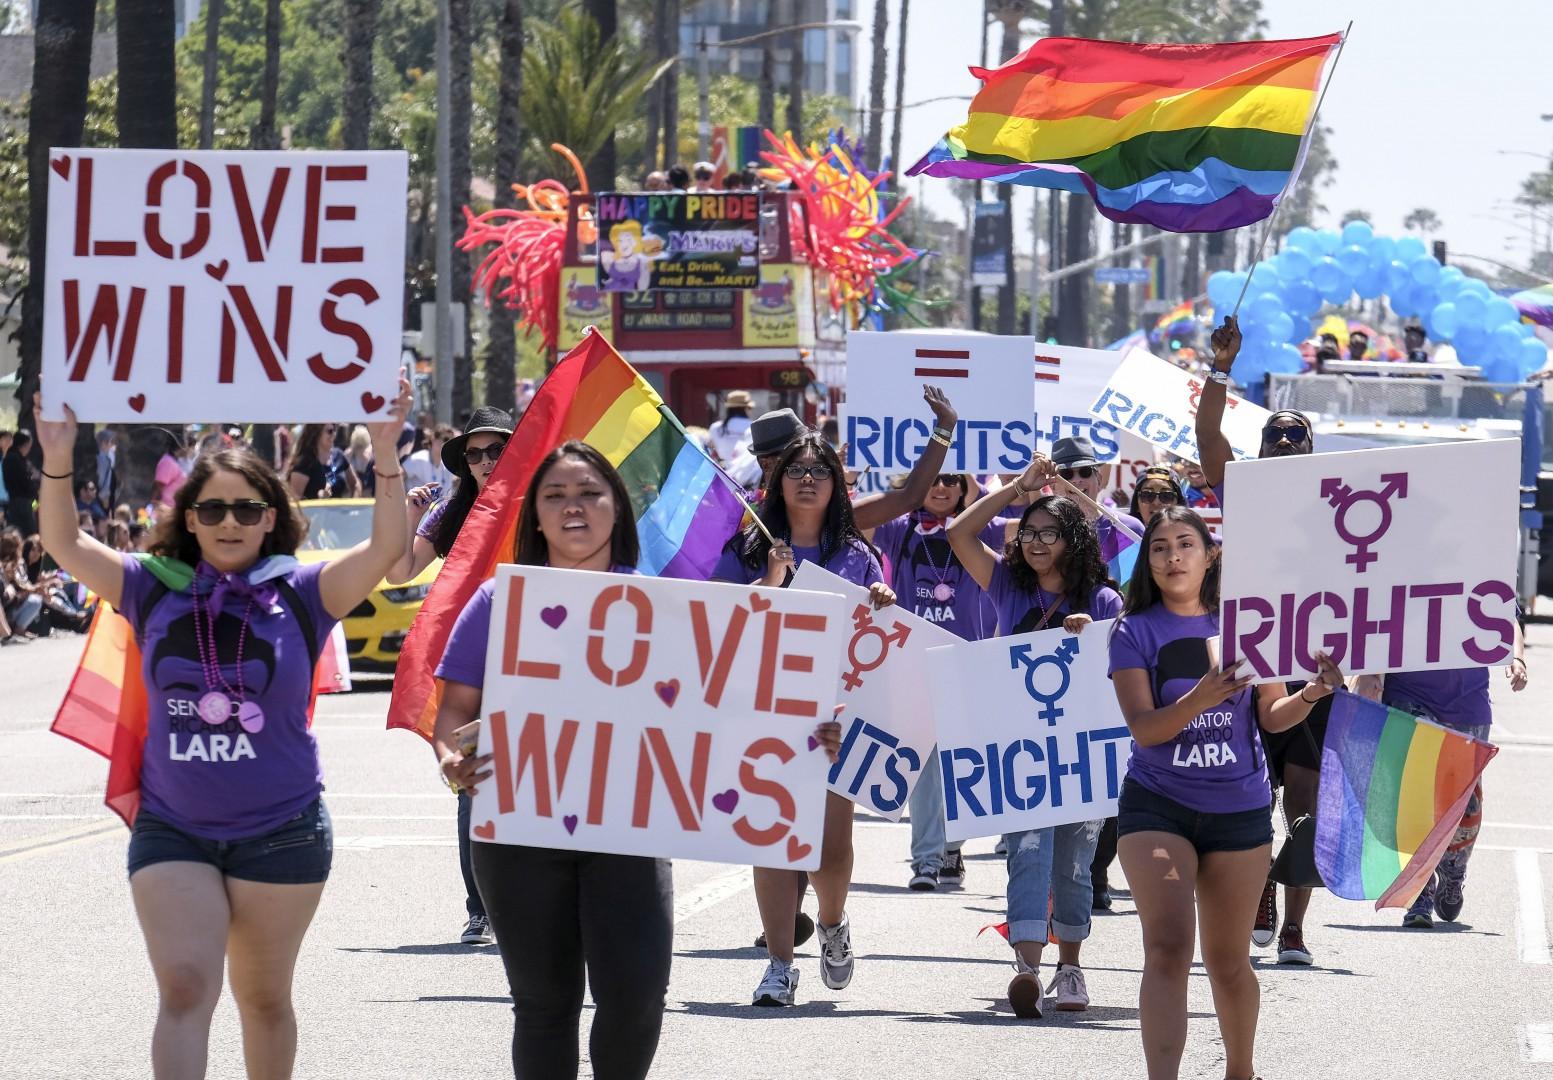 6月21日,在美国洛杉矶长滩市,民众走在游行队伍中。当天,数千民众参加了长滩市第34届同性恋同志骄傲大游行。新华社发 (赵汉荣摄) Thousands of people take to the streets for the 34th Annual Lesbian and Gay Pride Parade in Long Beach, California, the United States, on May 21, 2017. (Xinhua/Zhao Hanrong)